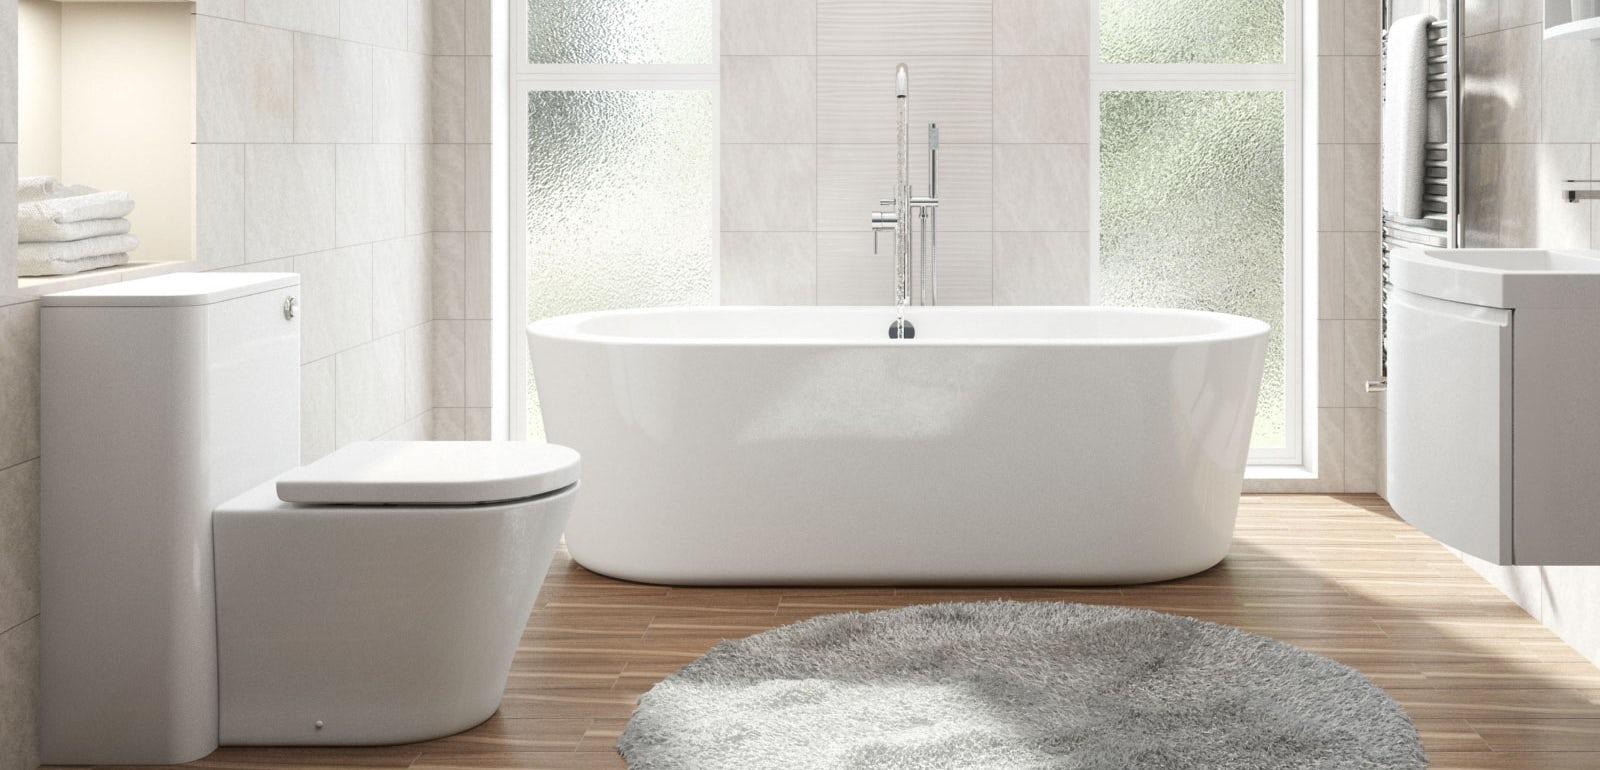 Attrayant Designing A Contemporary Style Bathroom